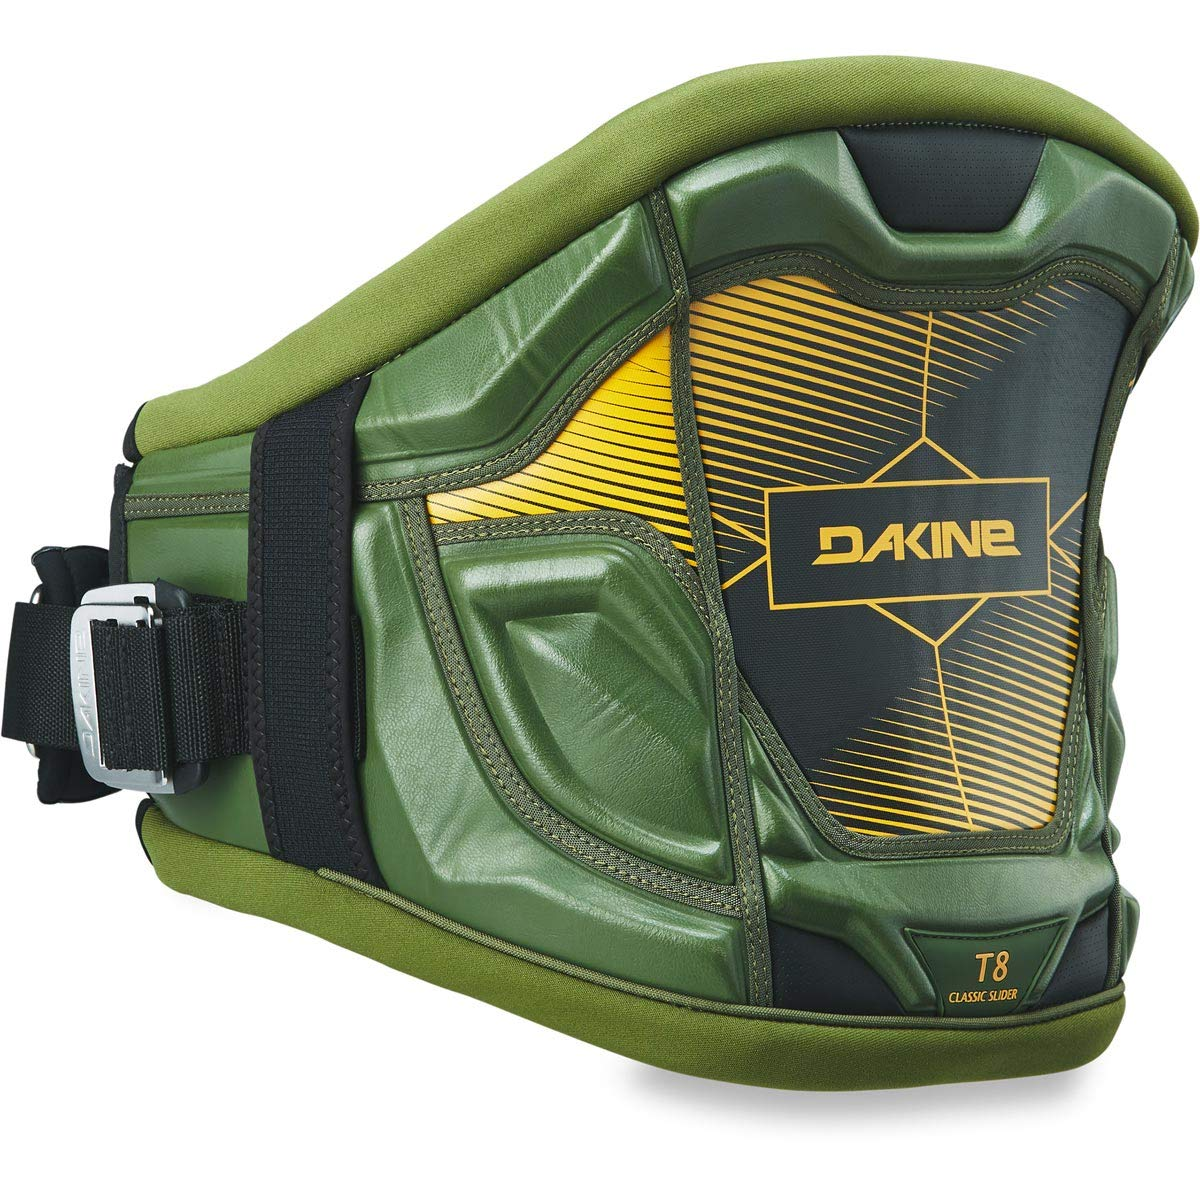 Dakine T-8 Classic Slider Windsurf Harness (Surplus, XLarge) by Dakine